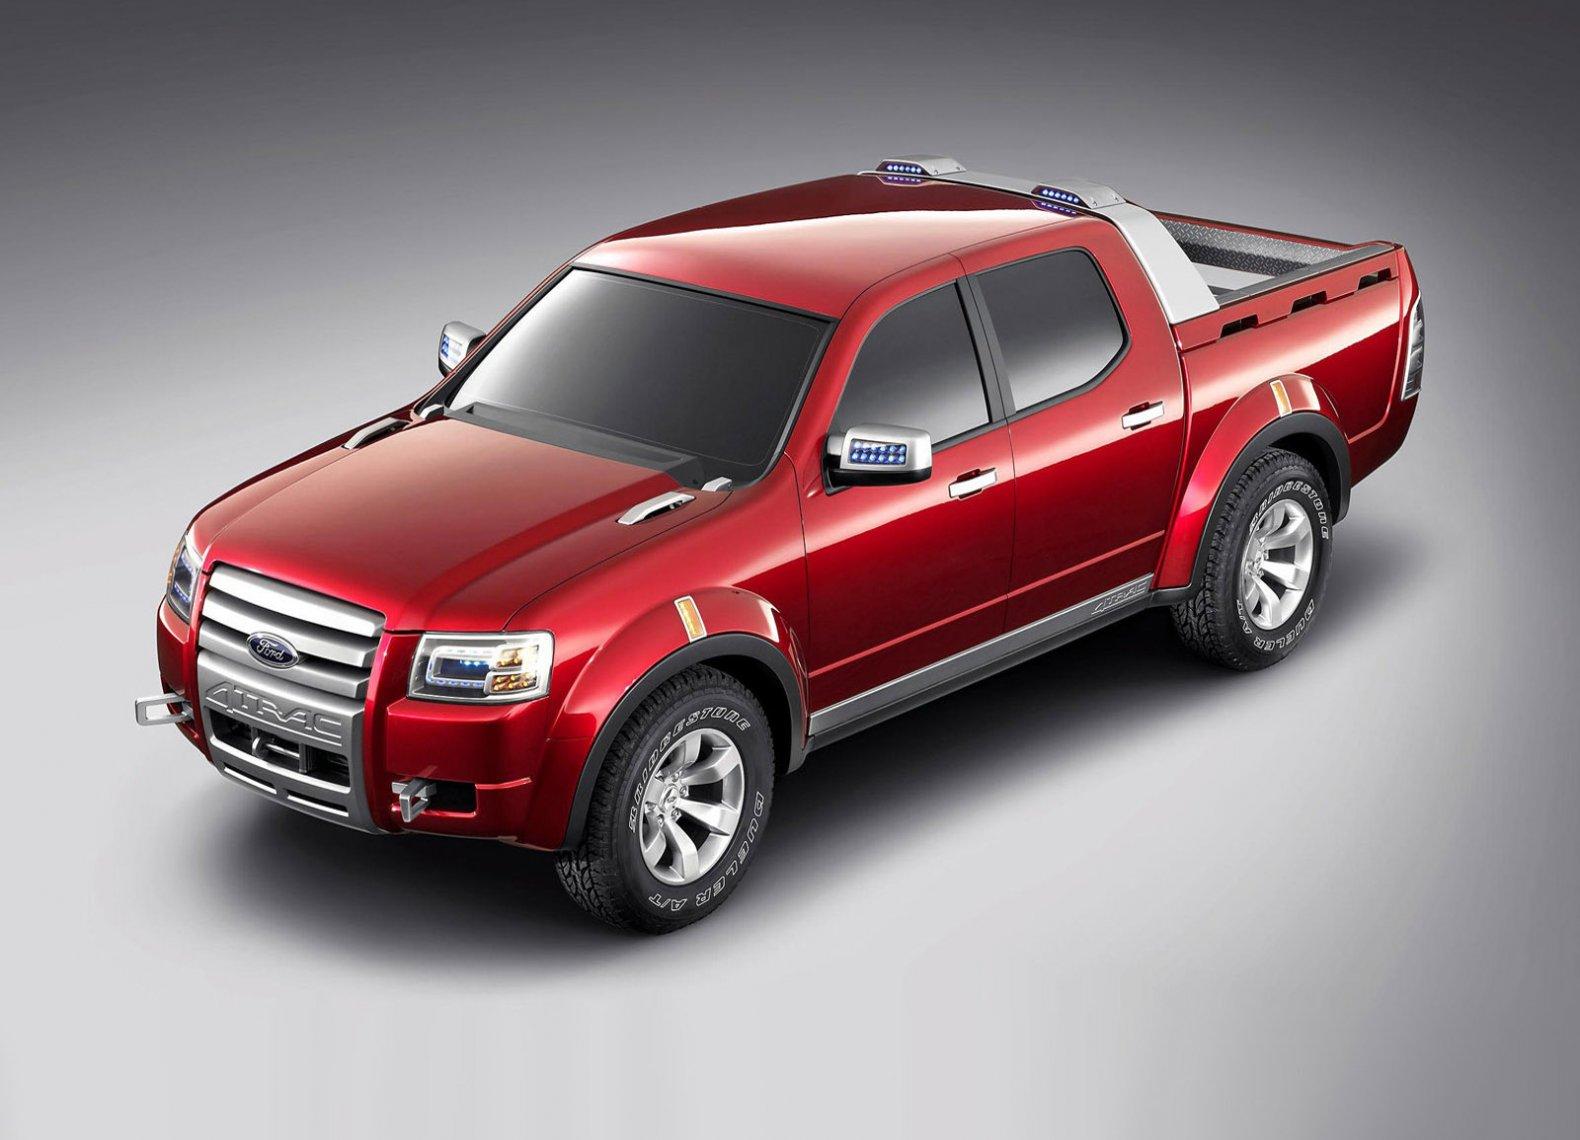 Ford F150 (Форд Ф150) - Продажа, Цены, Отзывы, Фото: 31 ...